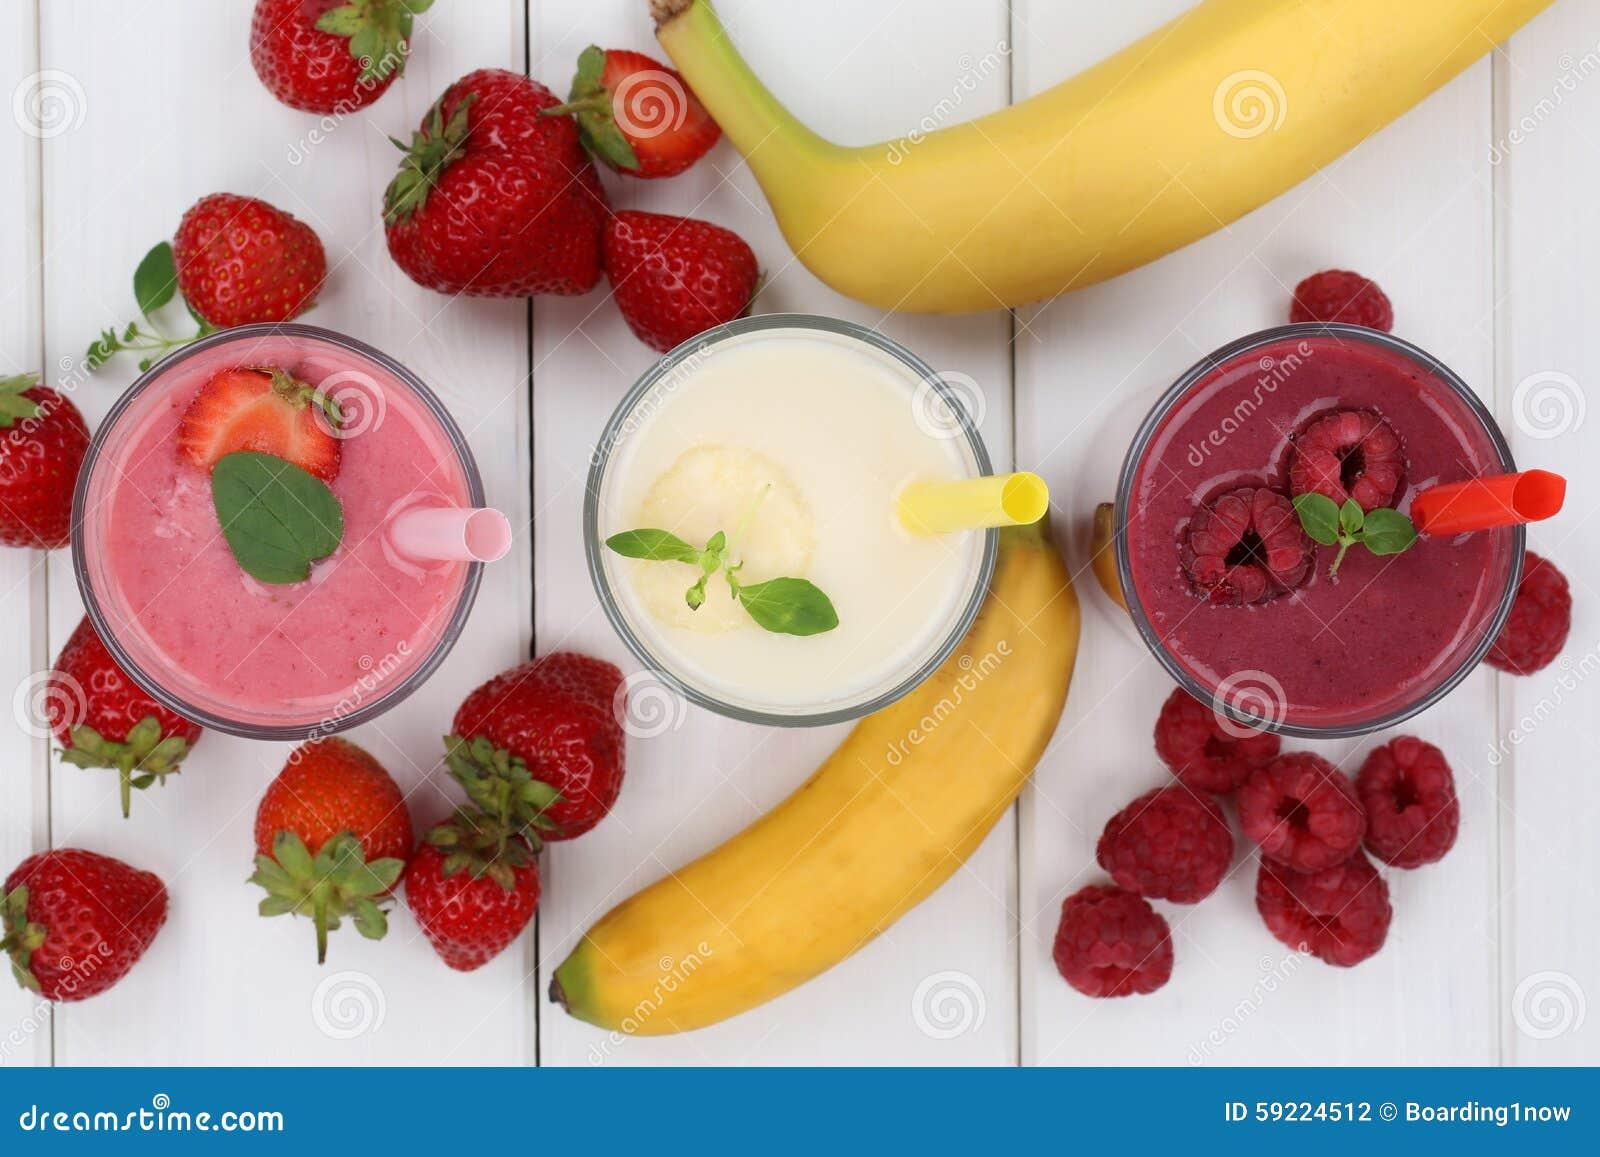 Smoothie fruit juice with fruits like strawberries, raspberries